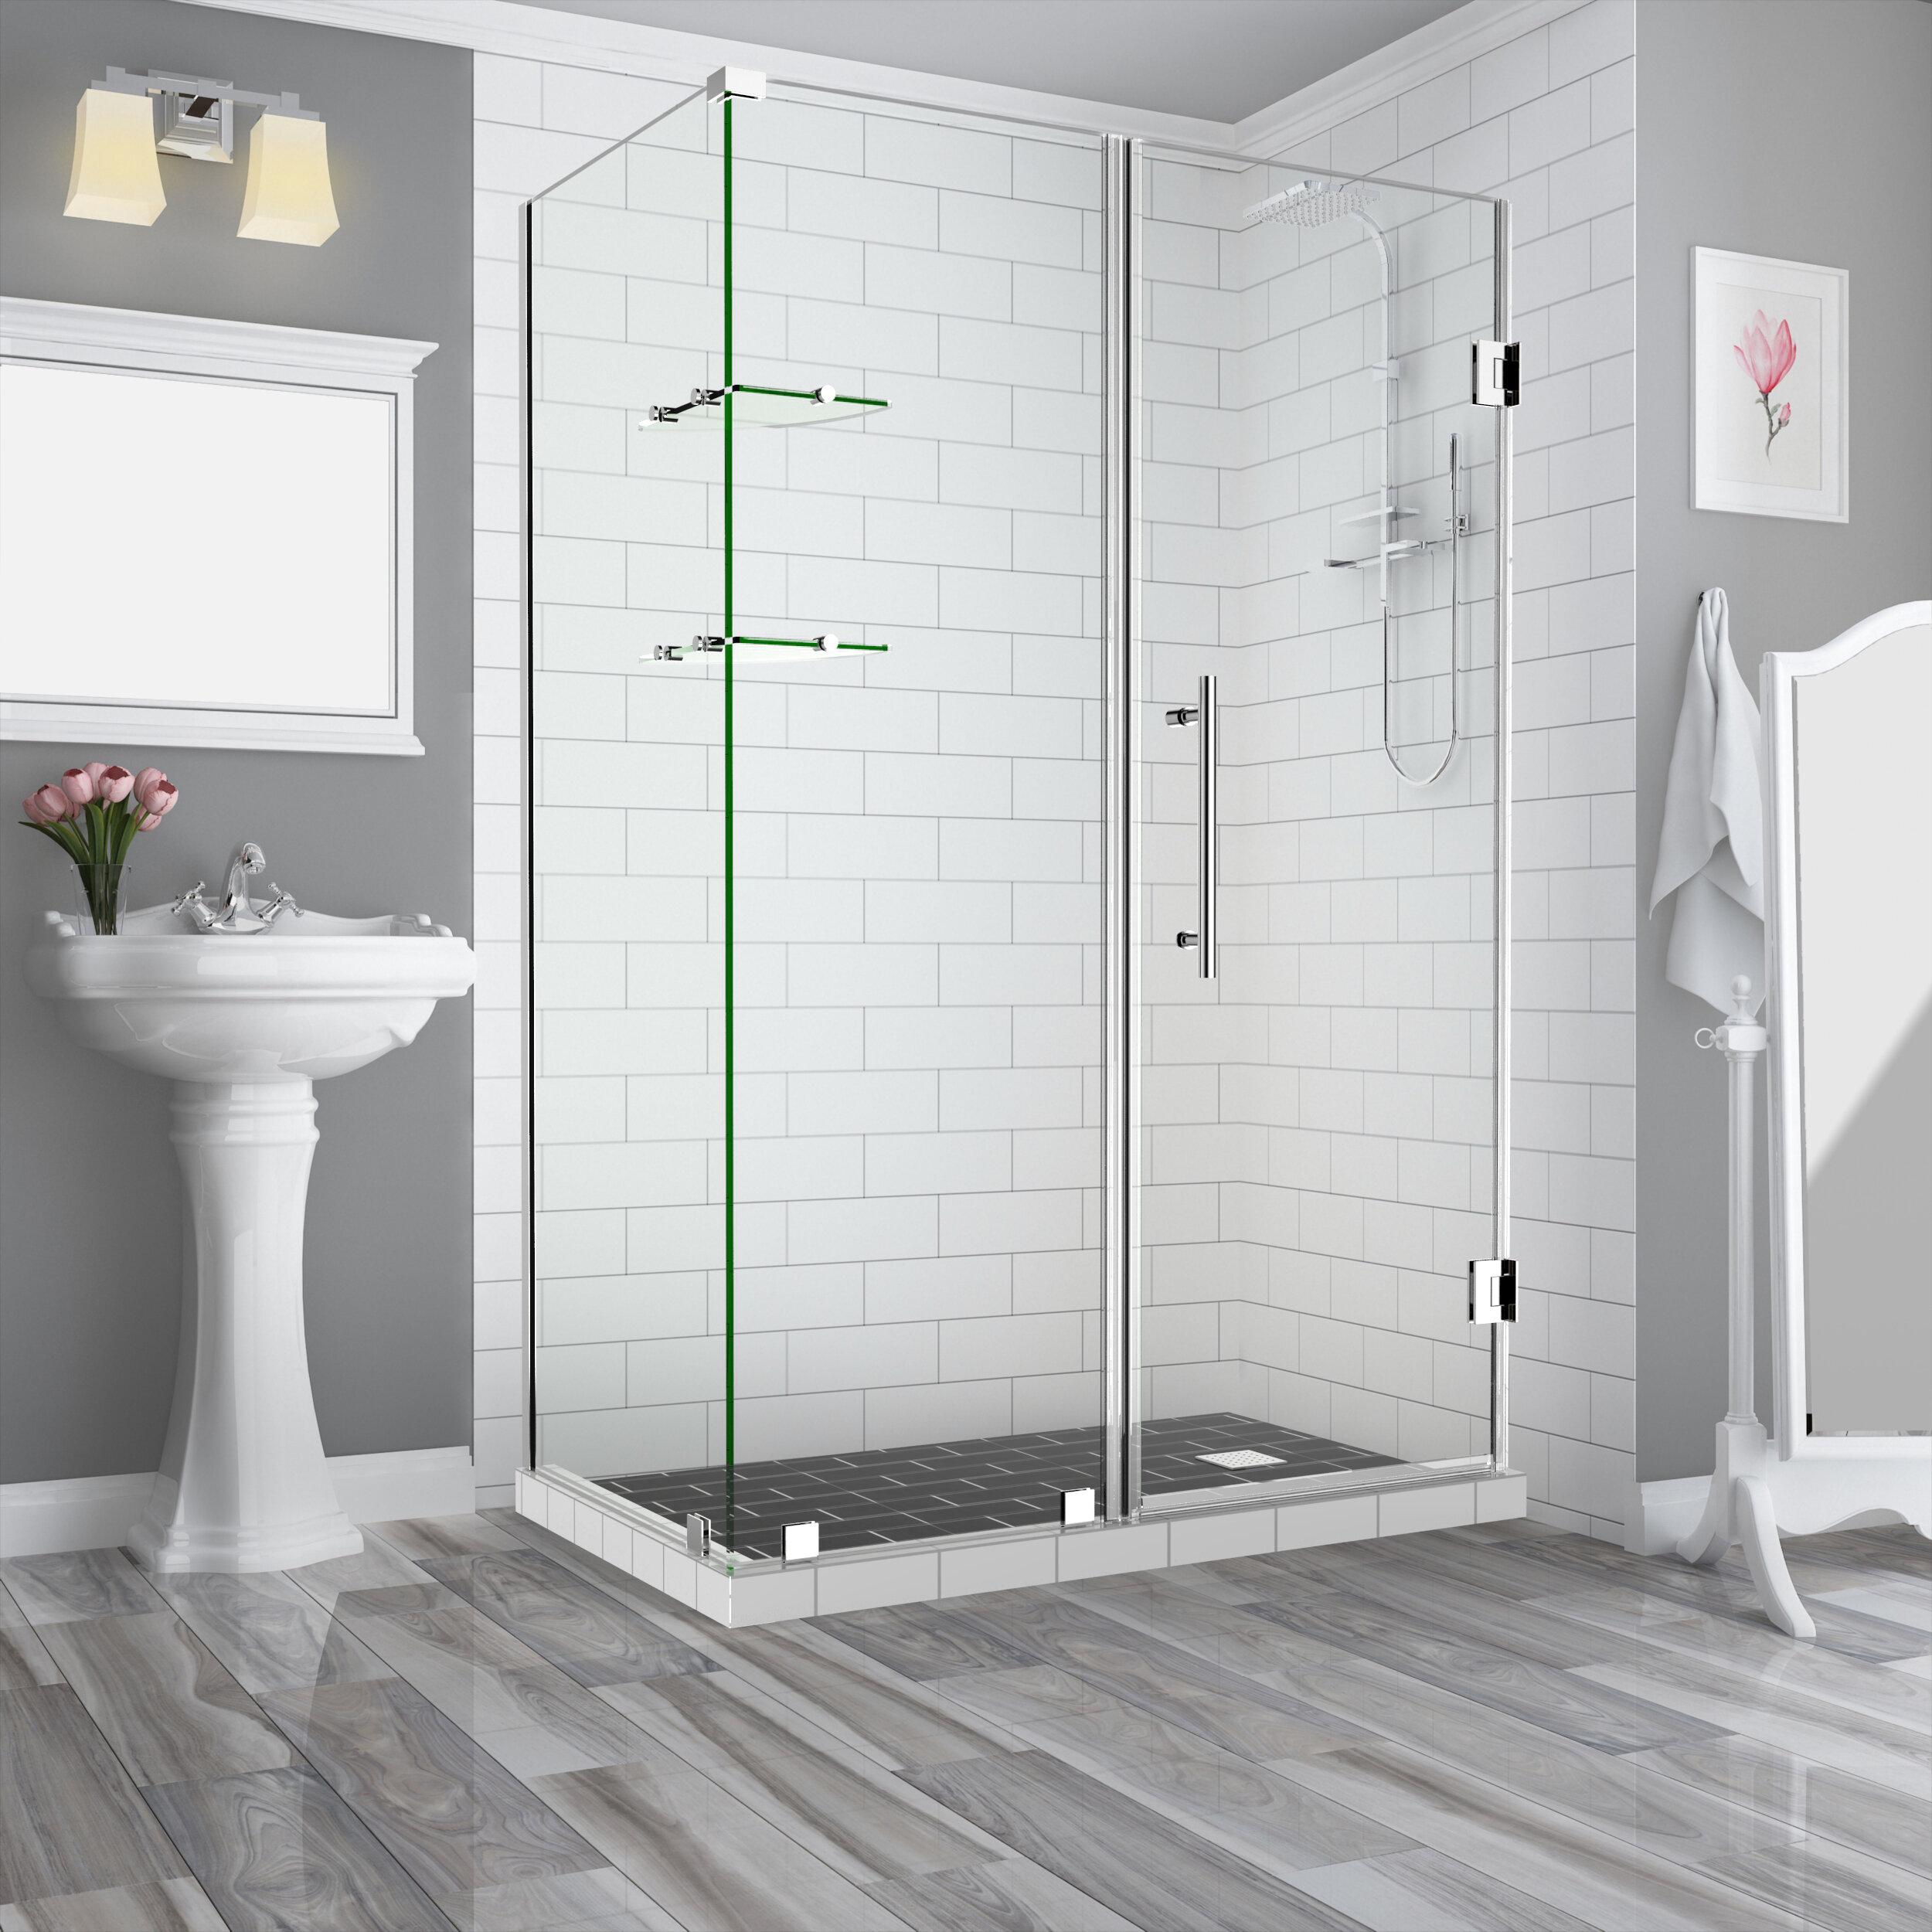 Bromley Gs 56 X 72 Hinged Semi Frameless Shower Door